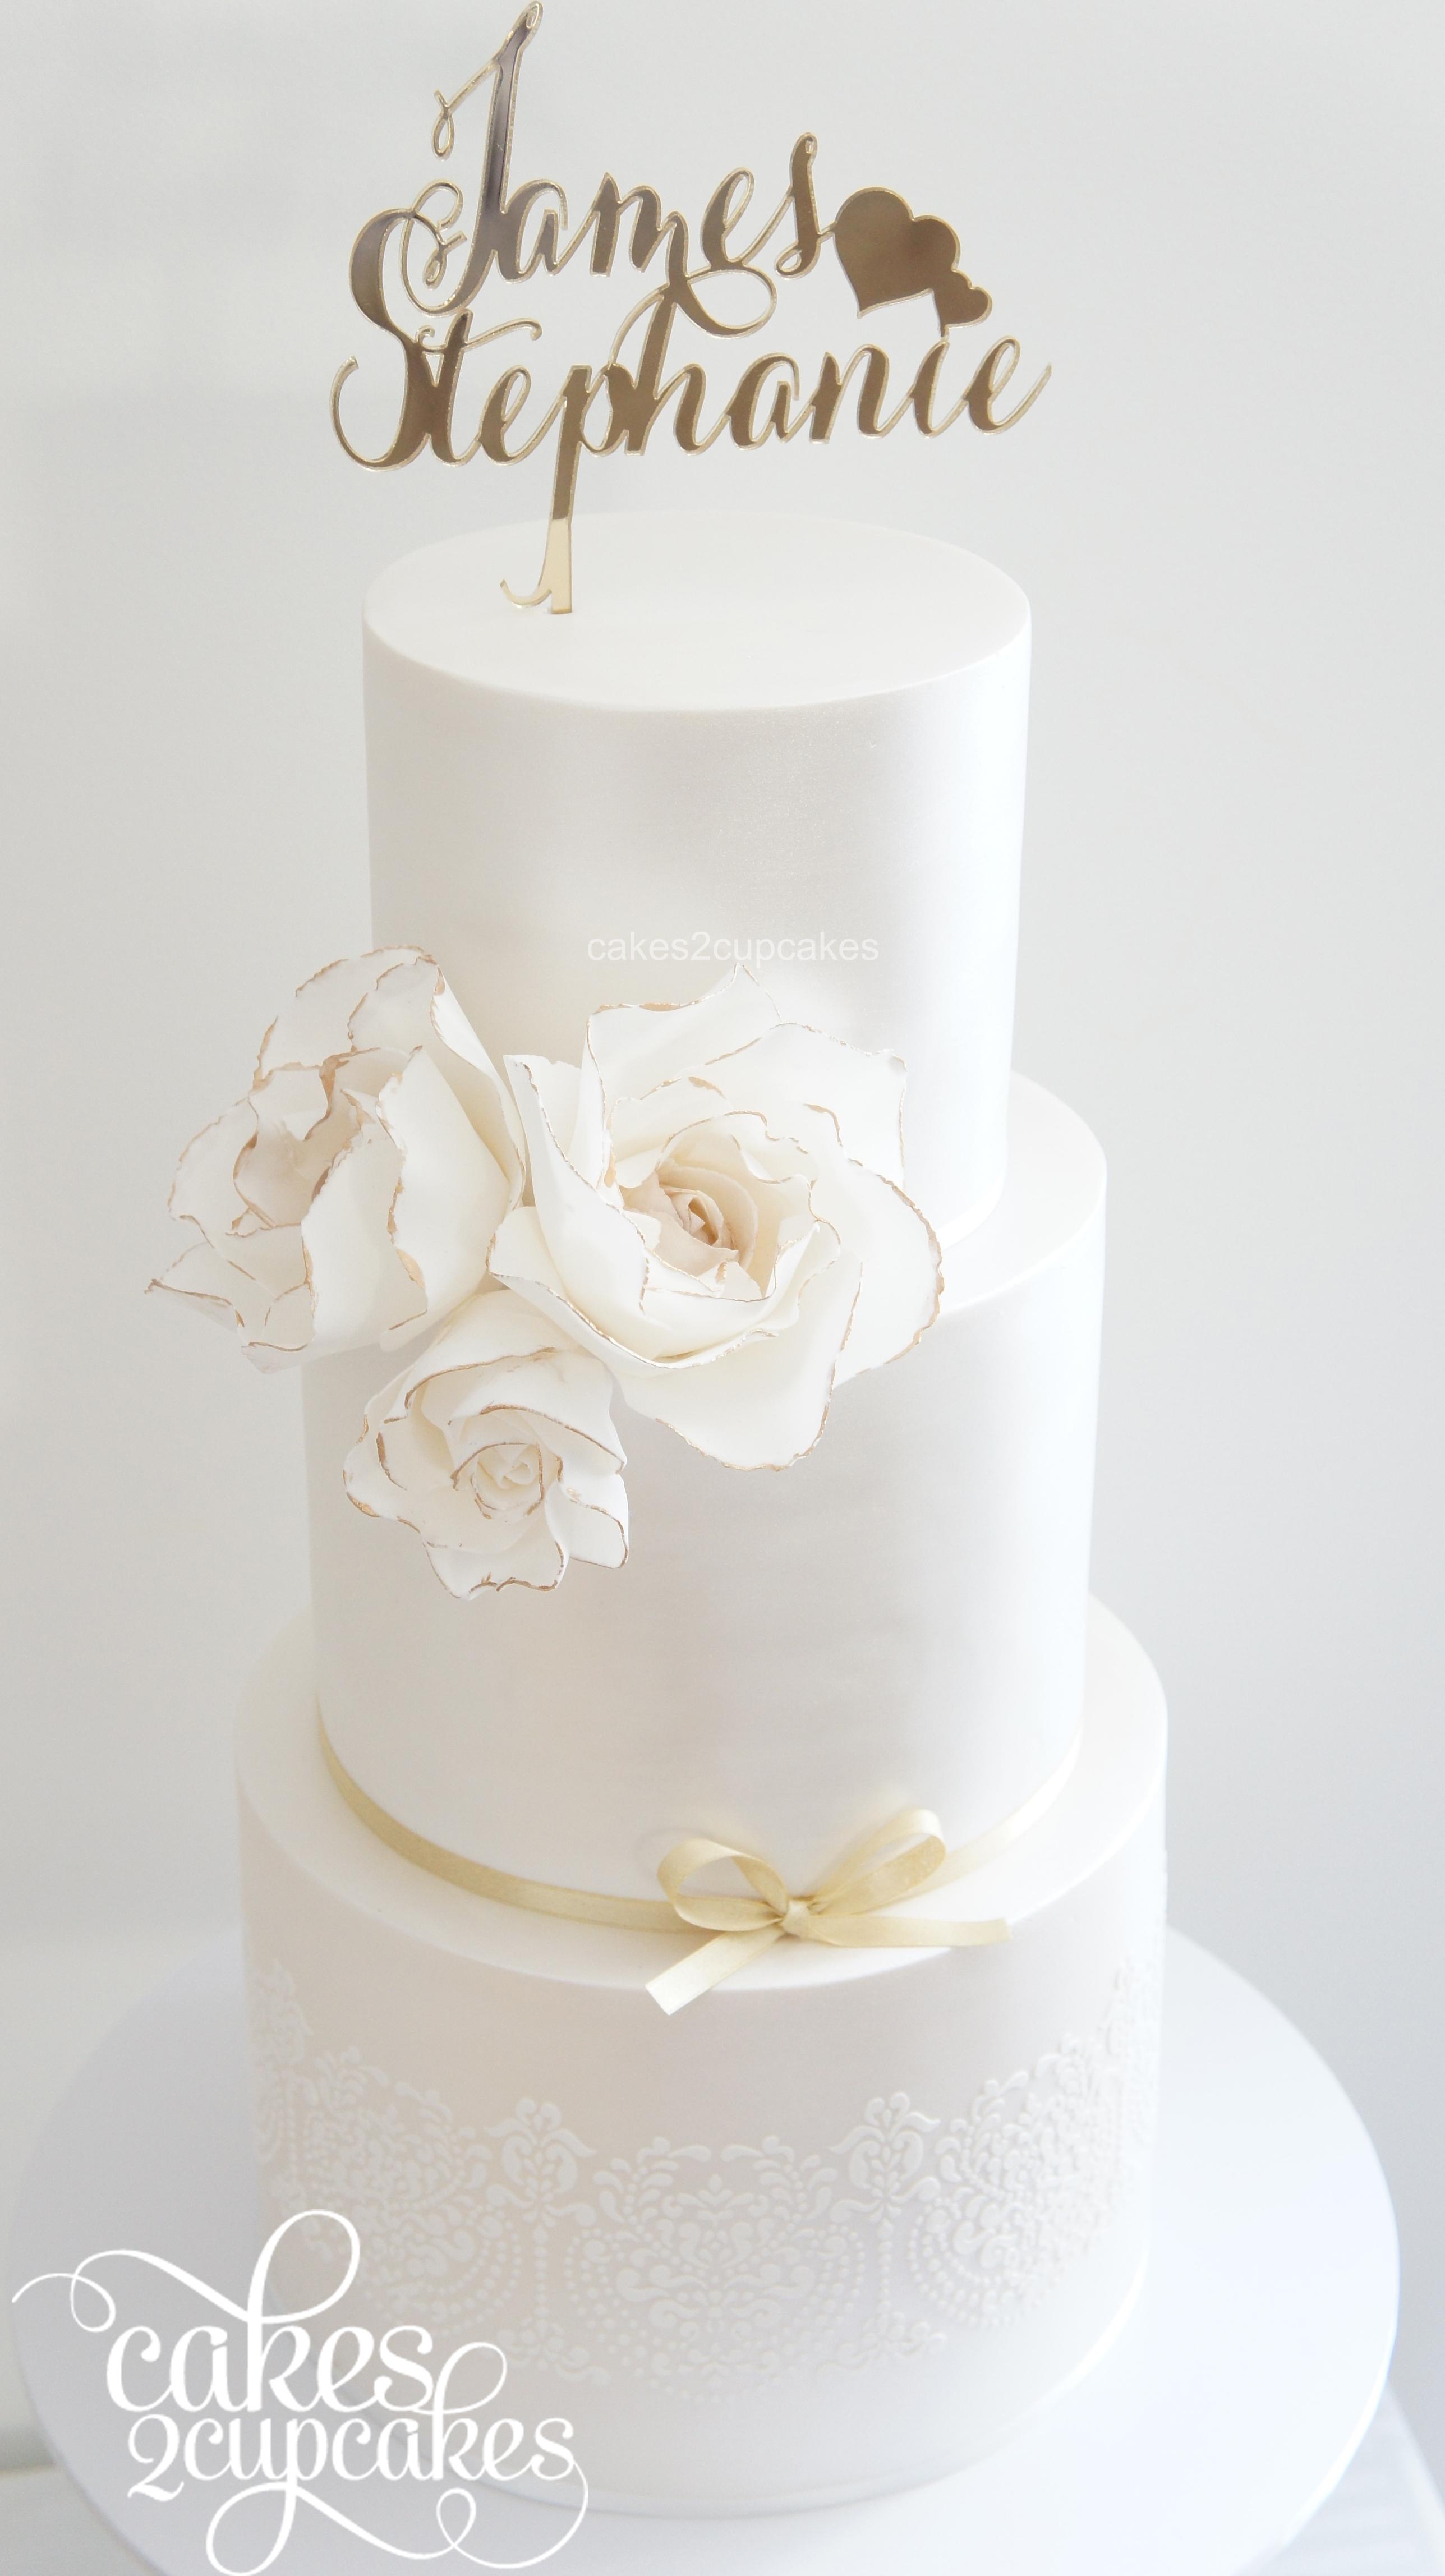 cakes2cupcakes-white-gold.jpg